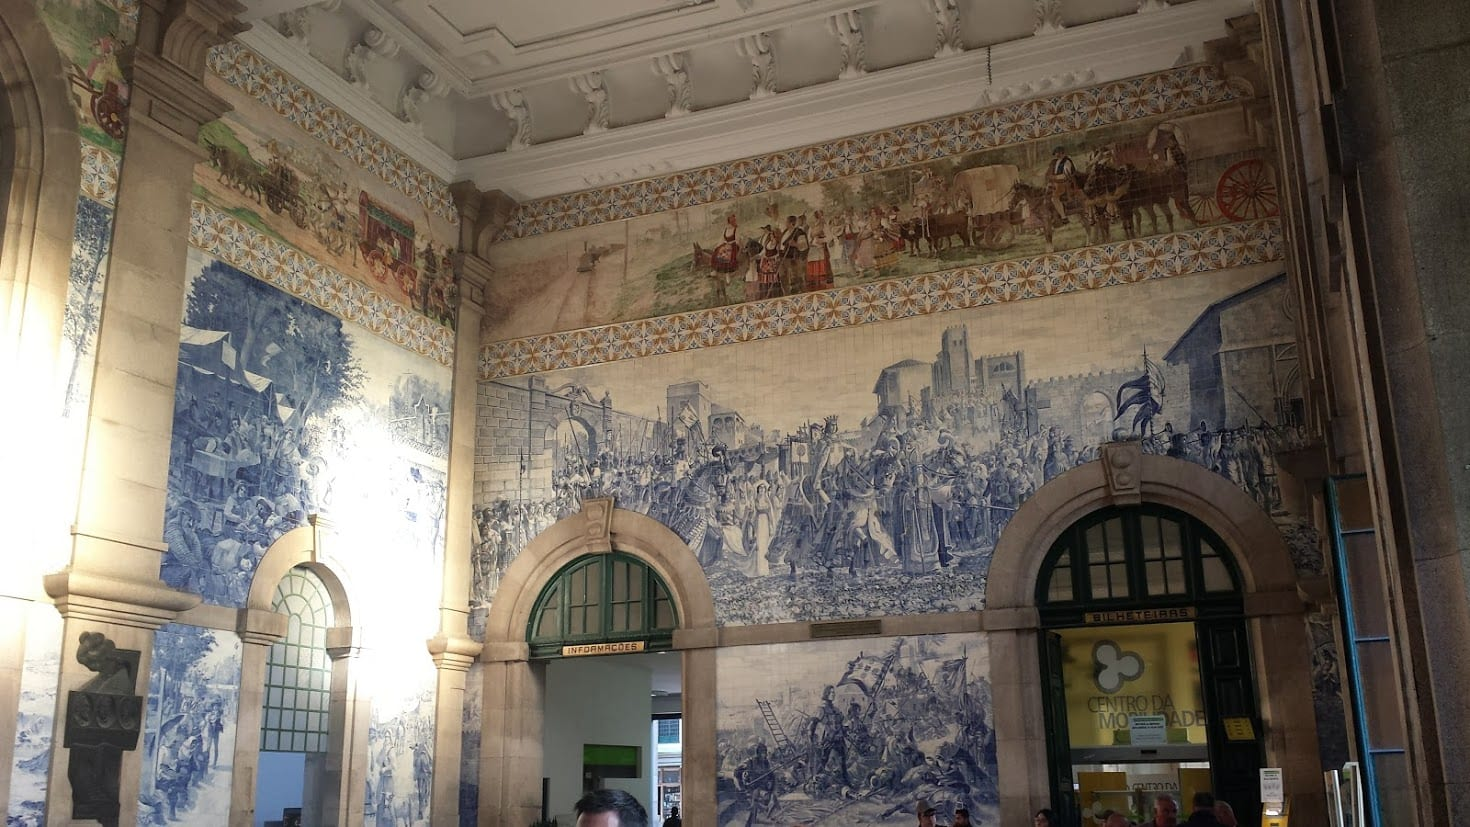 The Sao Bento Station in Porto